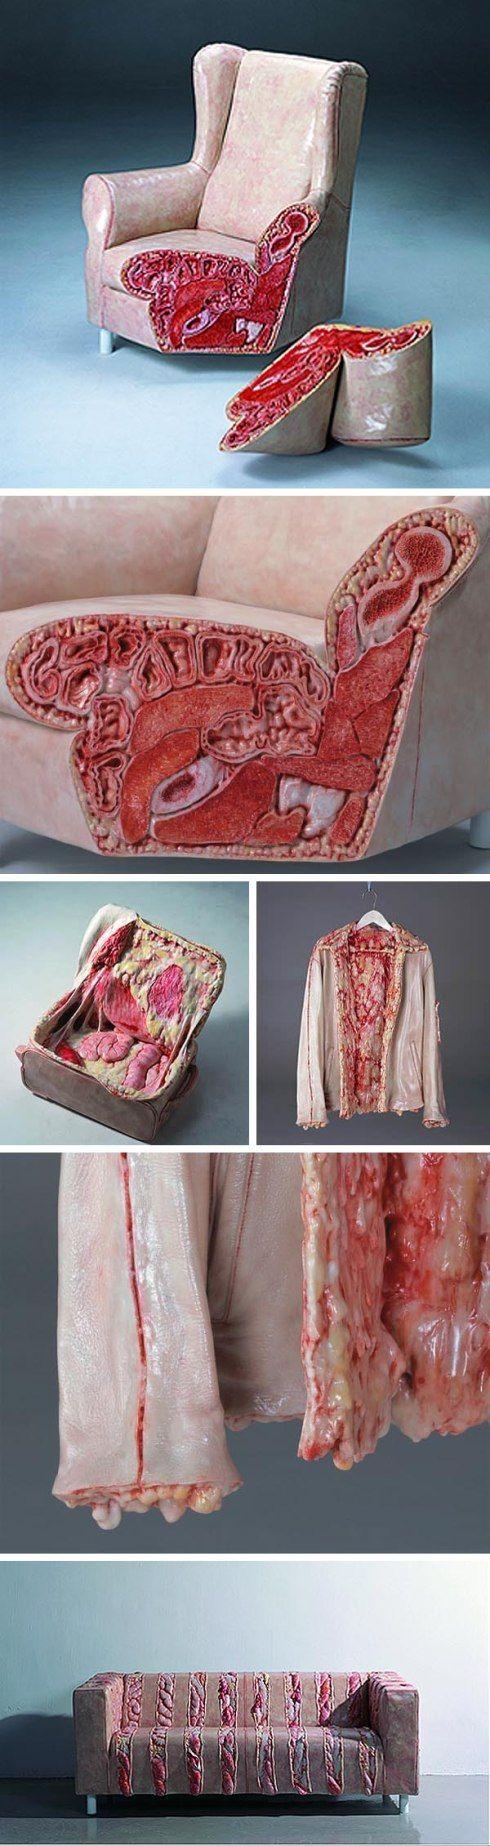 Cao Hui: Fleshy Sculptures